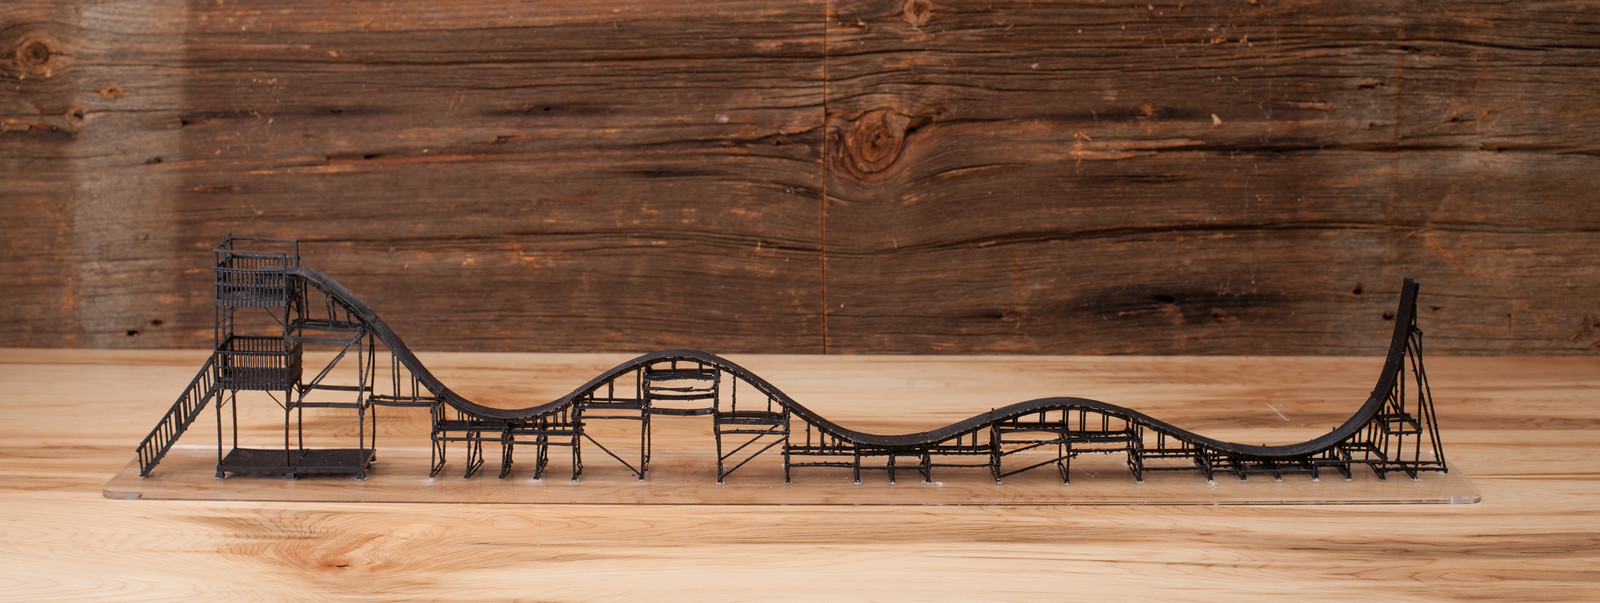 Ben Katz roller coaster model